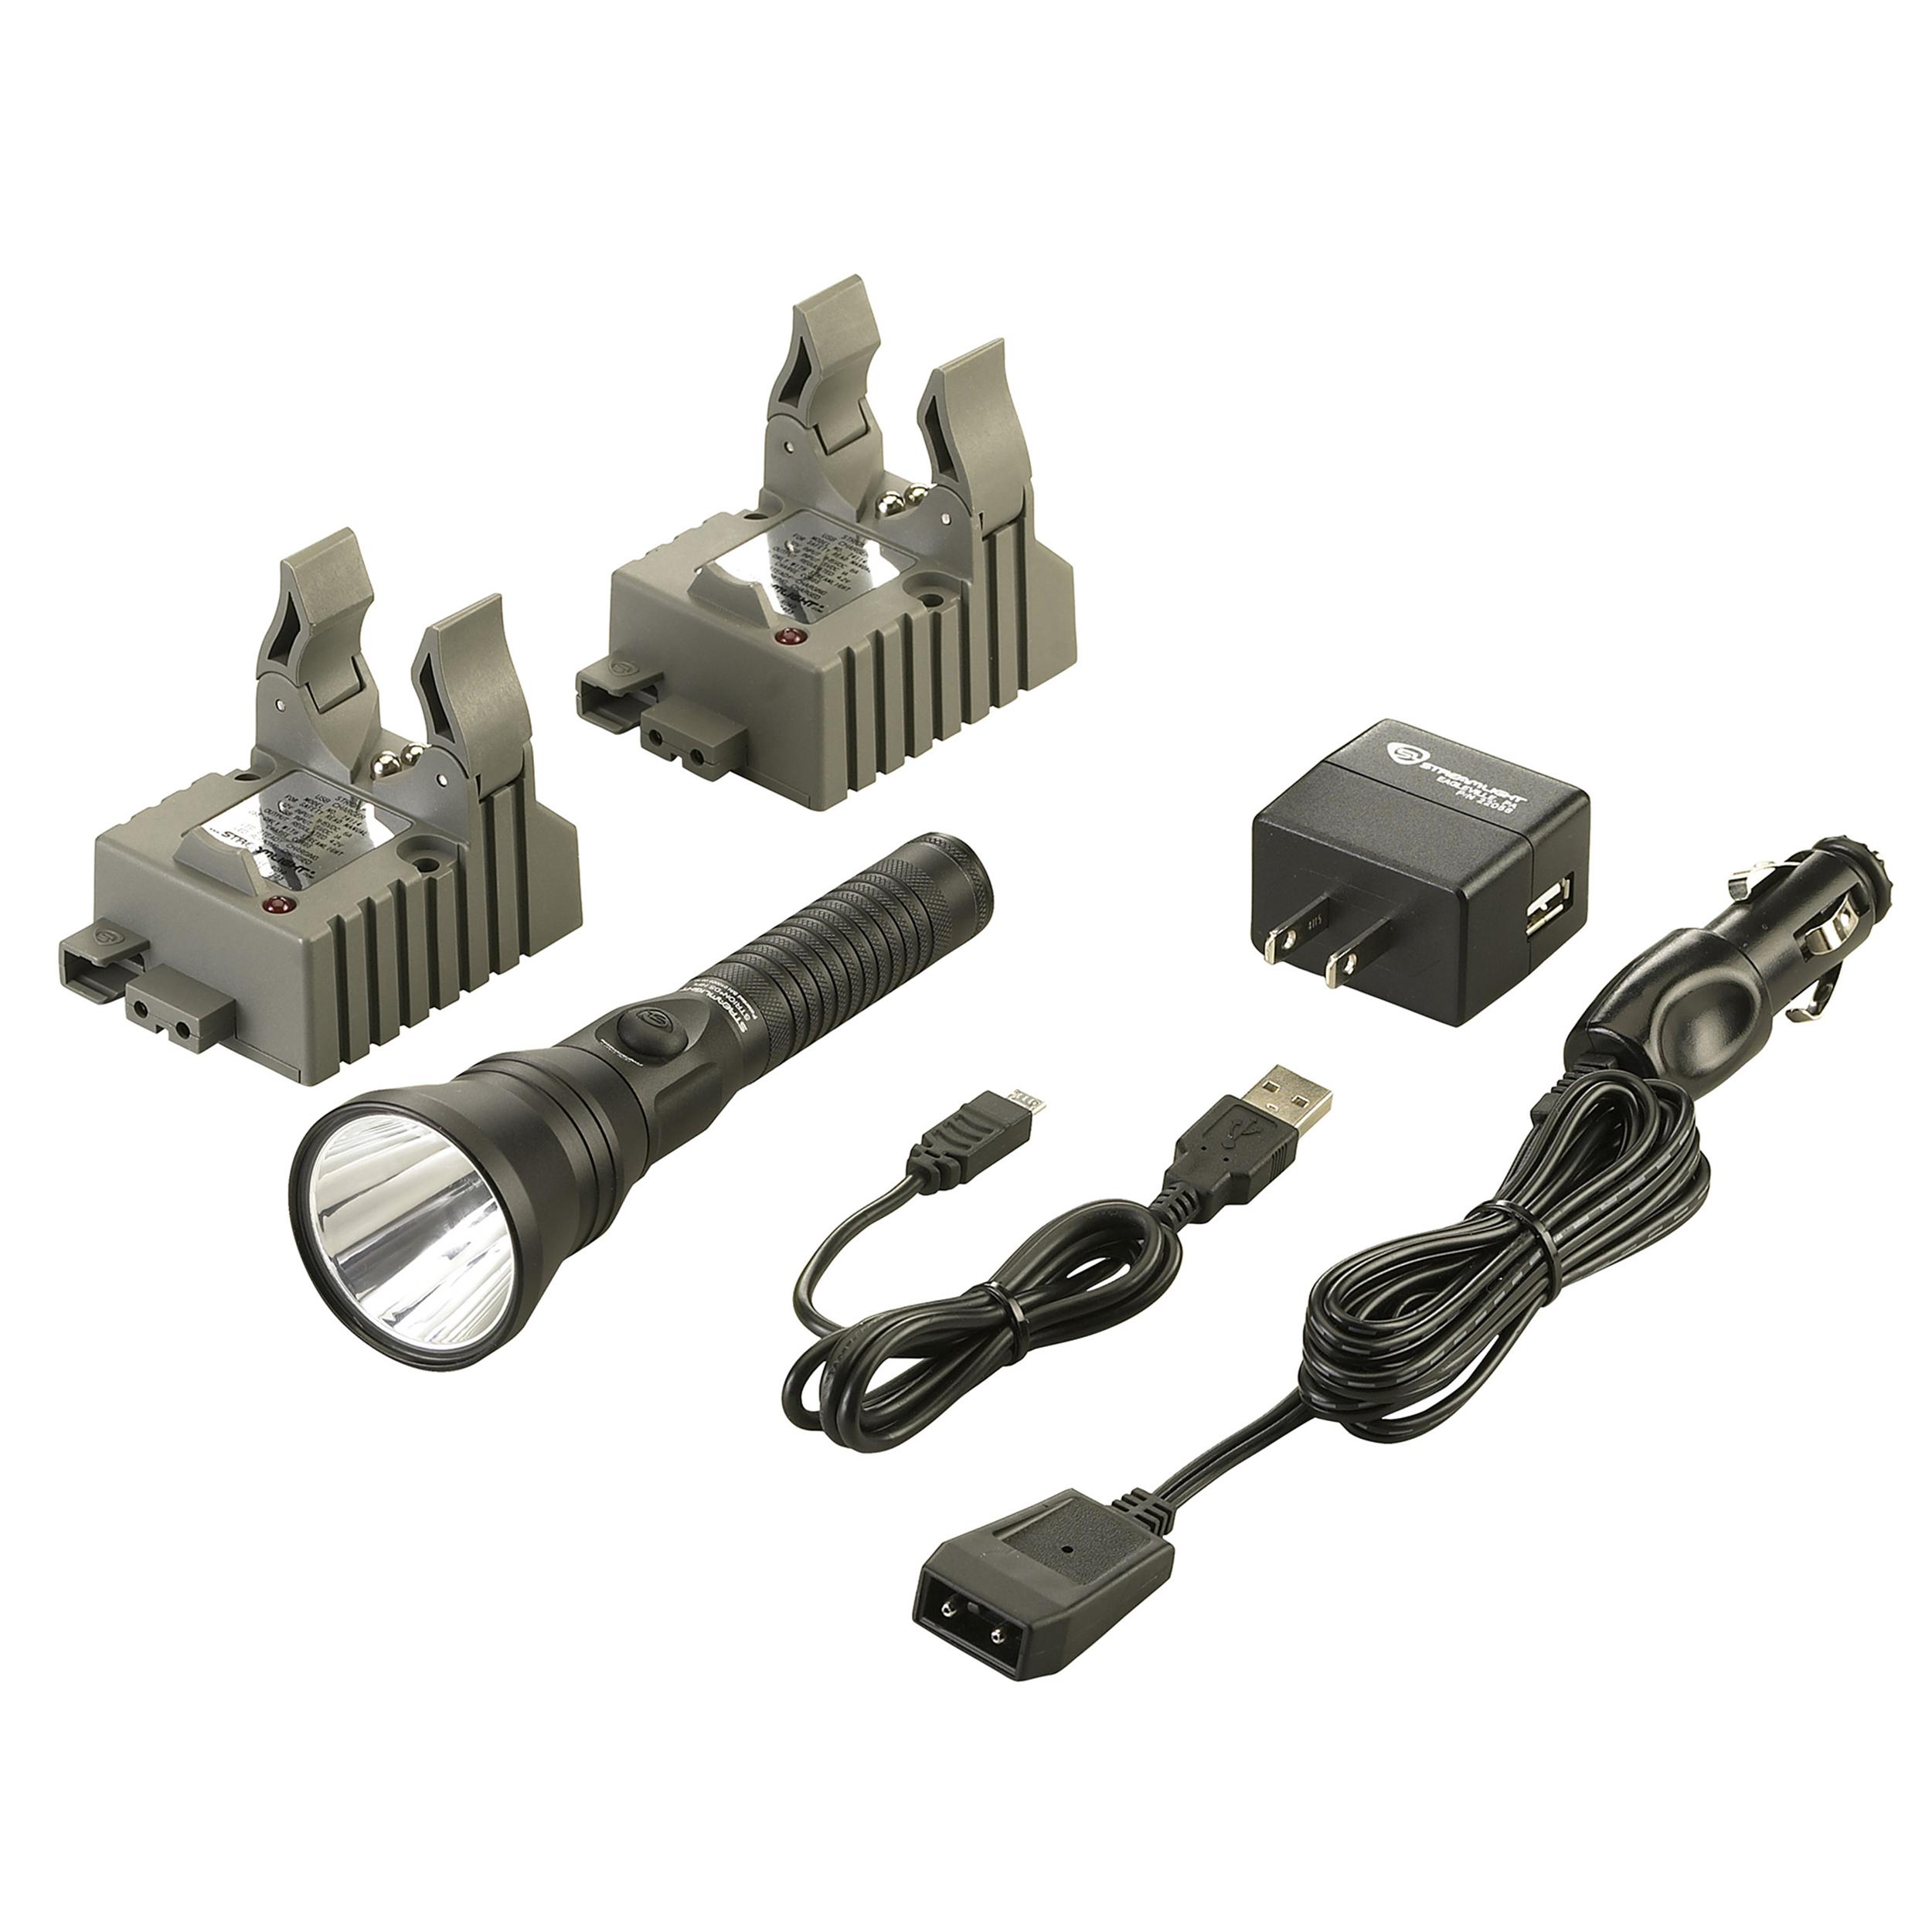 Streamlight Strion DS HPL IEC Type A (120V/100V) AC/12V DC, 2 Holder